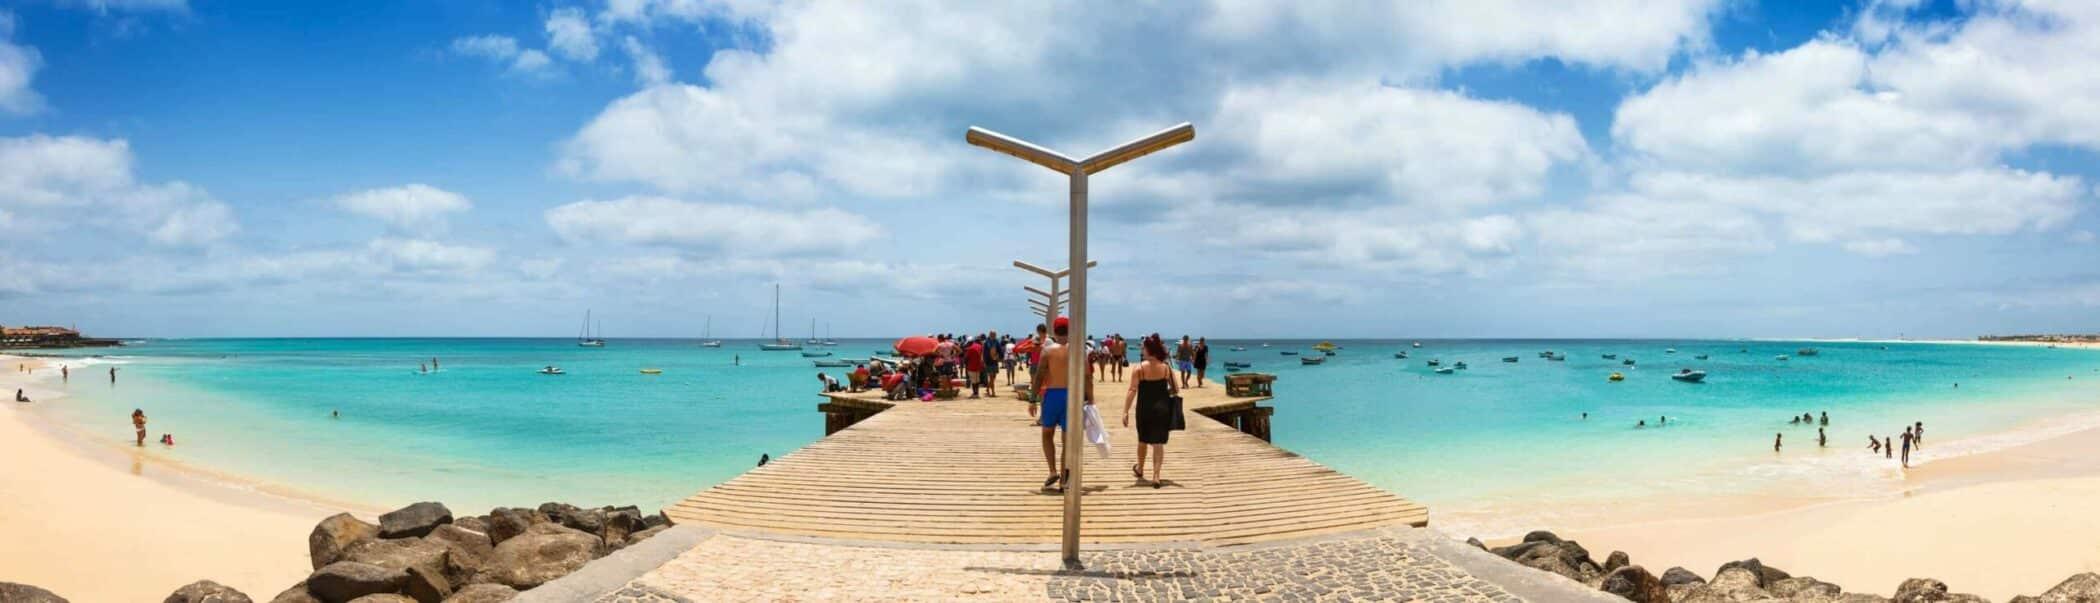 Santa Maria beach pontoon in Sal Island Cape Verde - Cabo Verde.